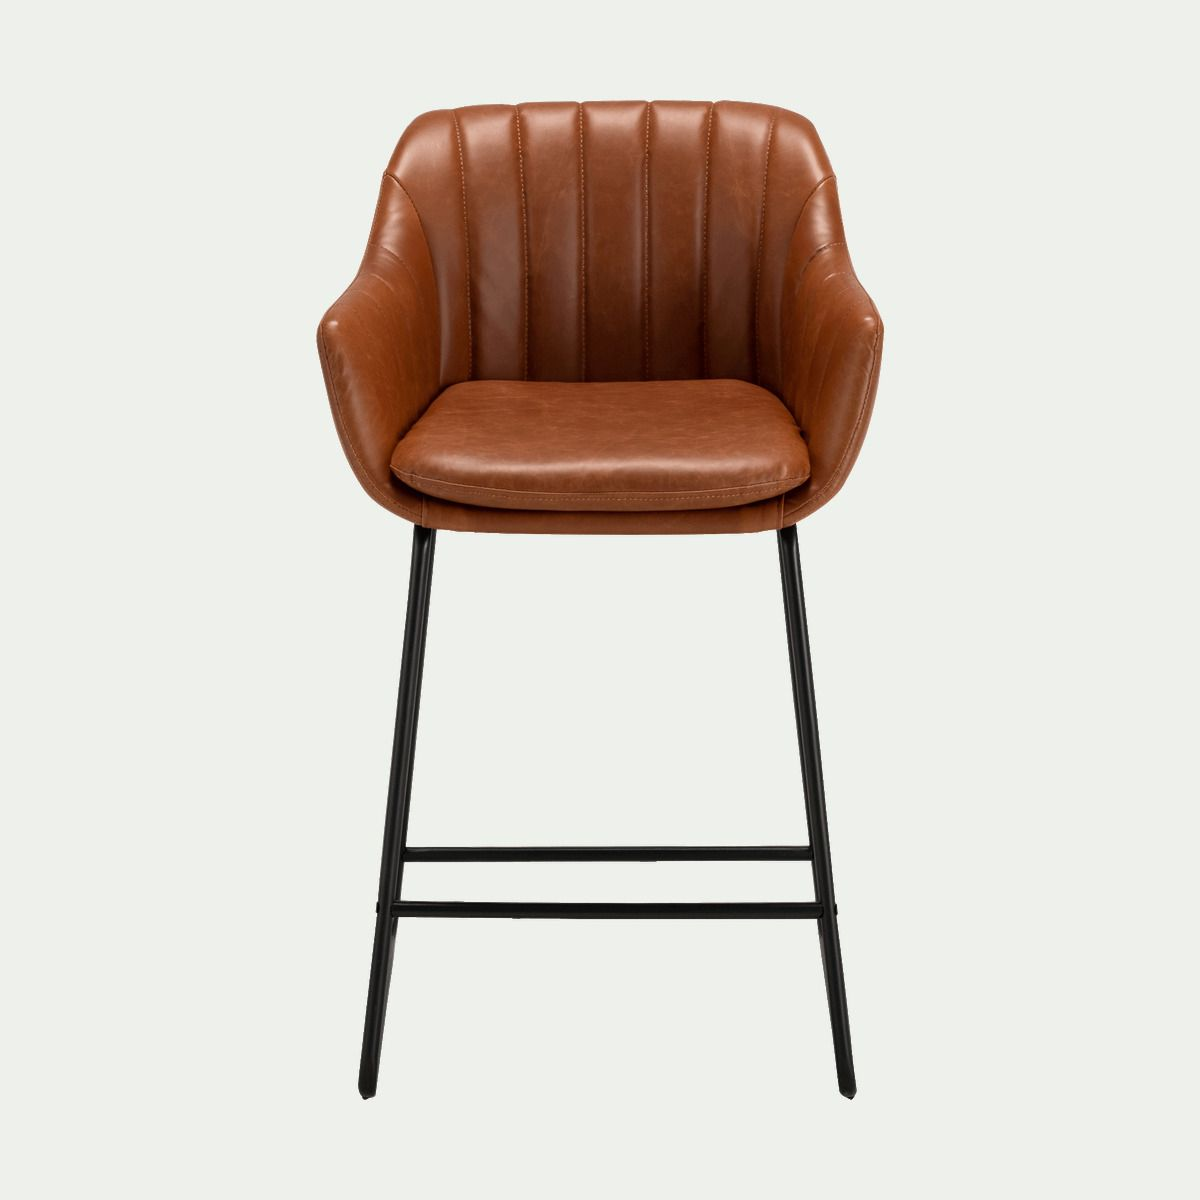 Chaise Haute En Simili Cuir Marron Olbia Tabouret De Bar En 2020 Chaise Haute Tabouret De Bar Chaise Plan De Travail